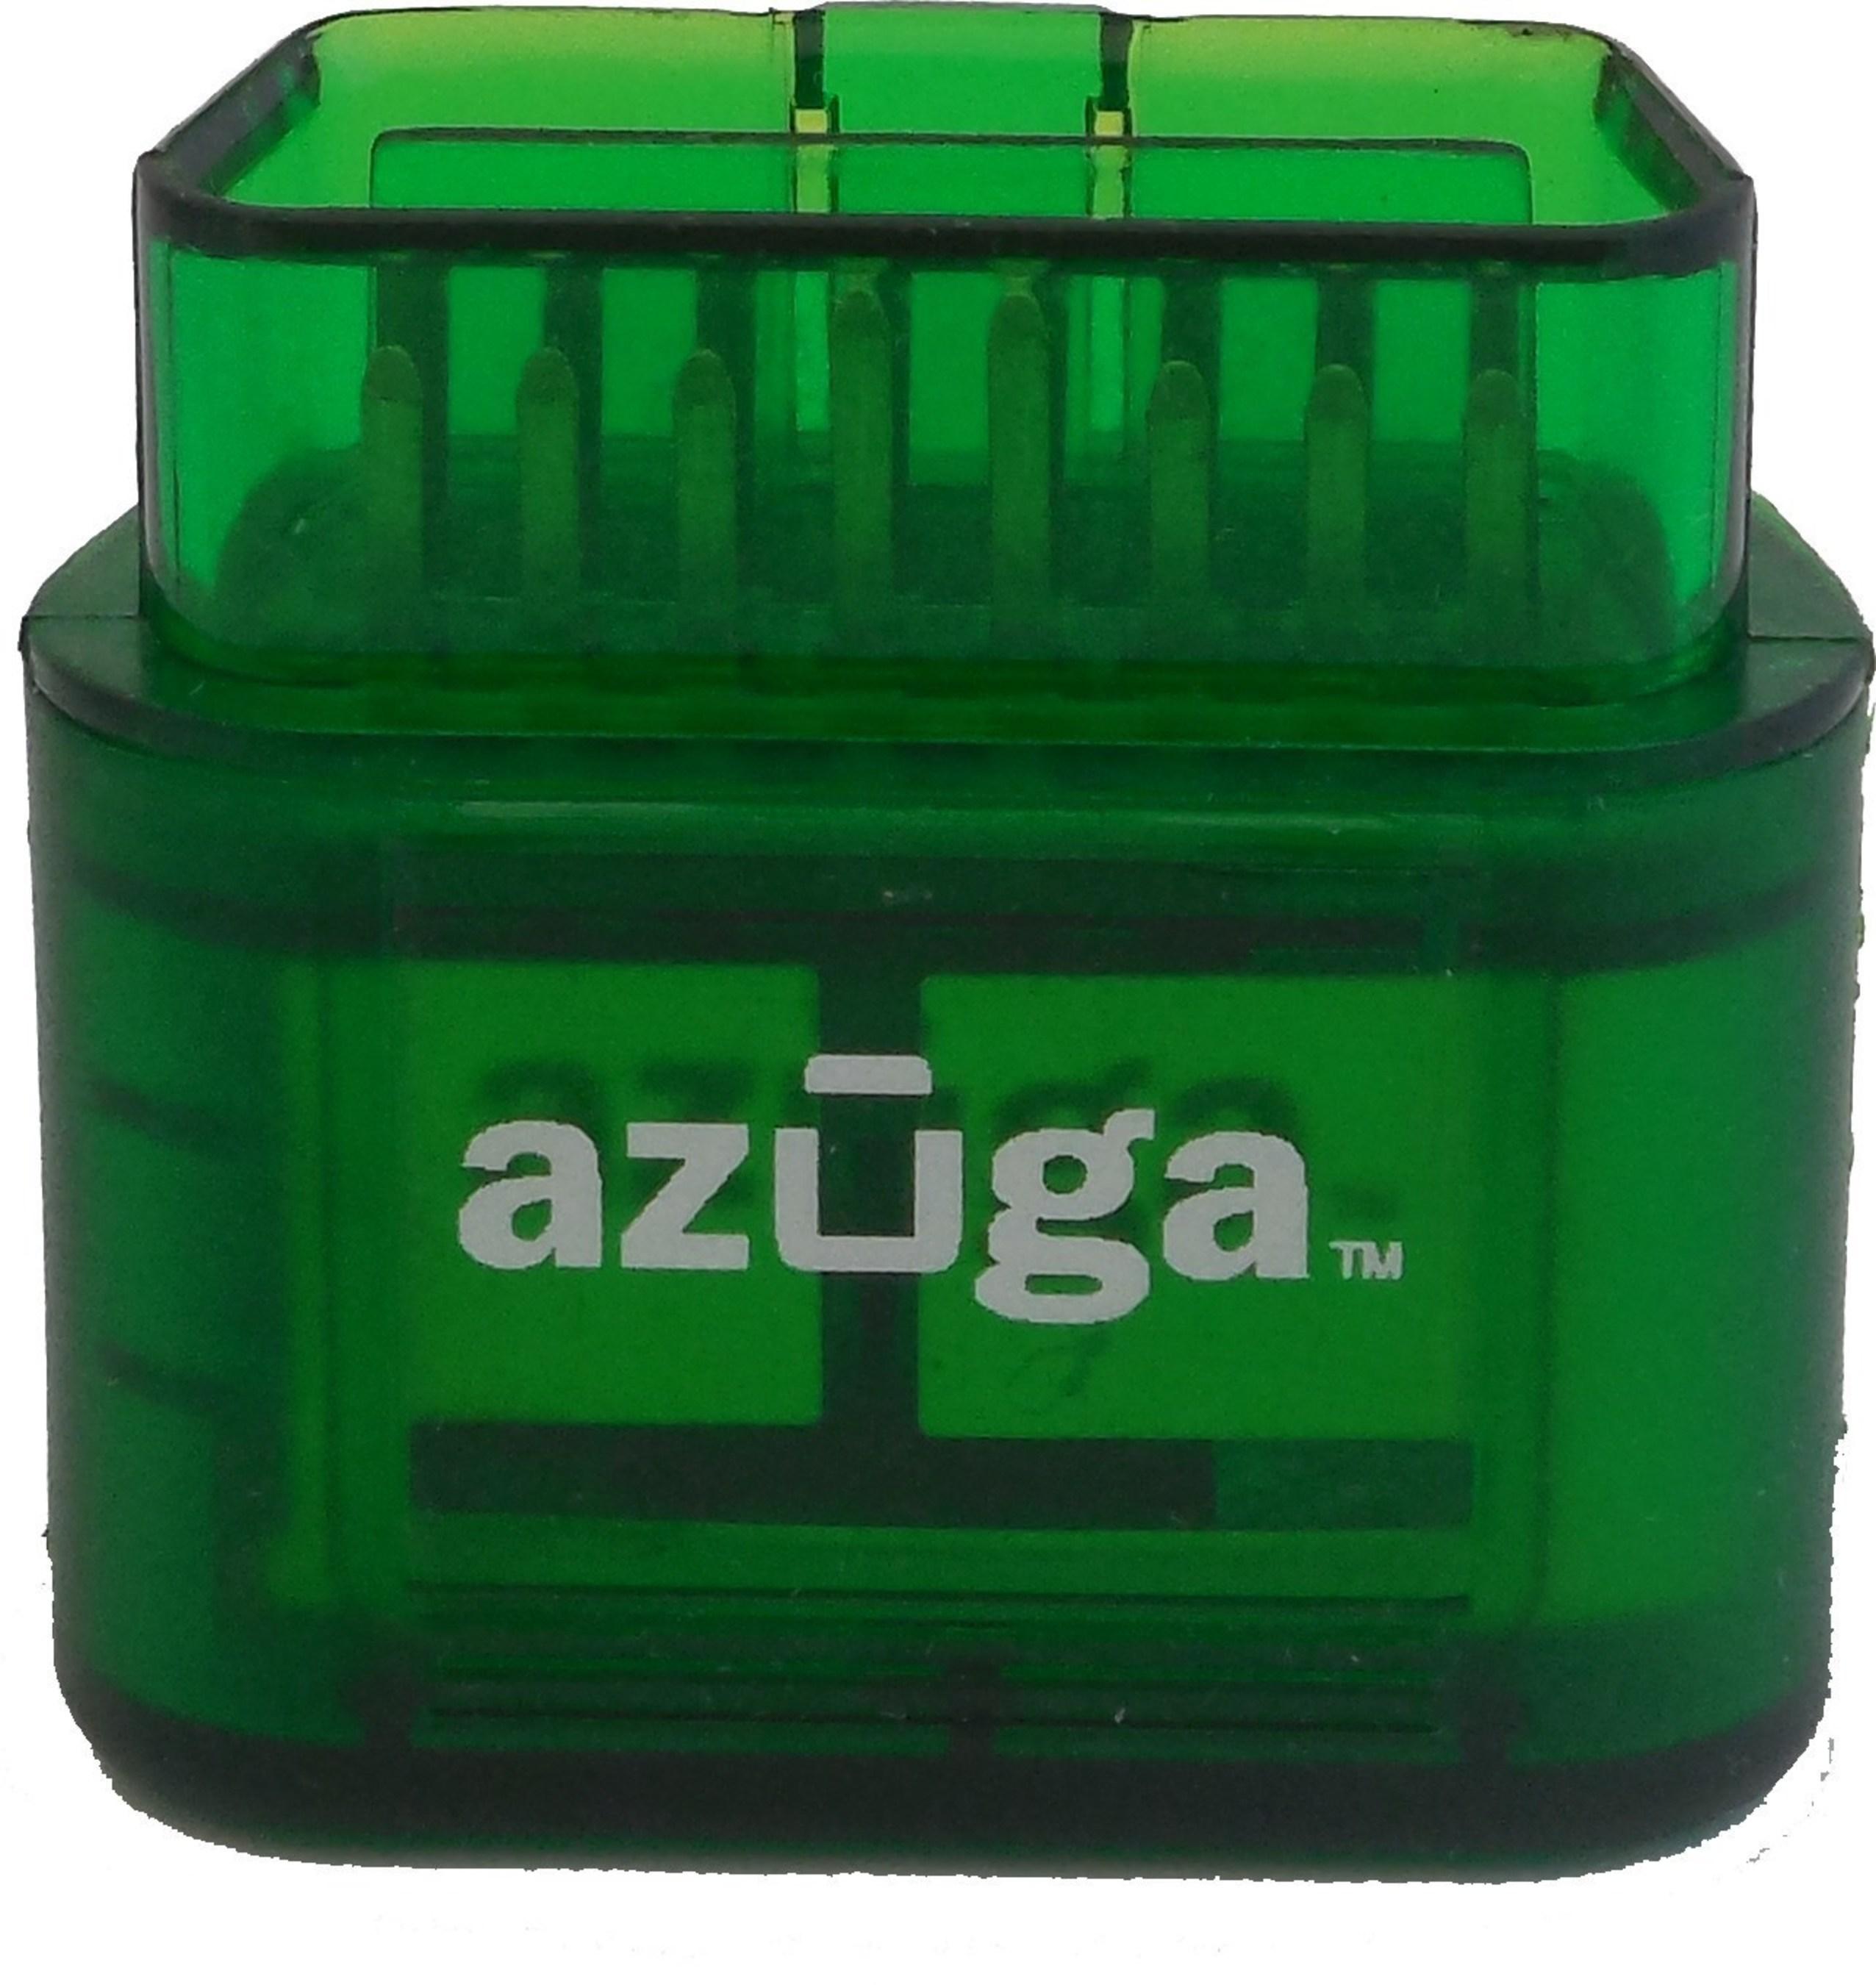 Azuga selected as CAM provider for ODOT road usage program